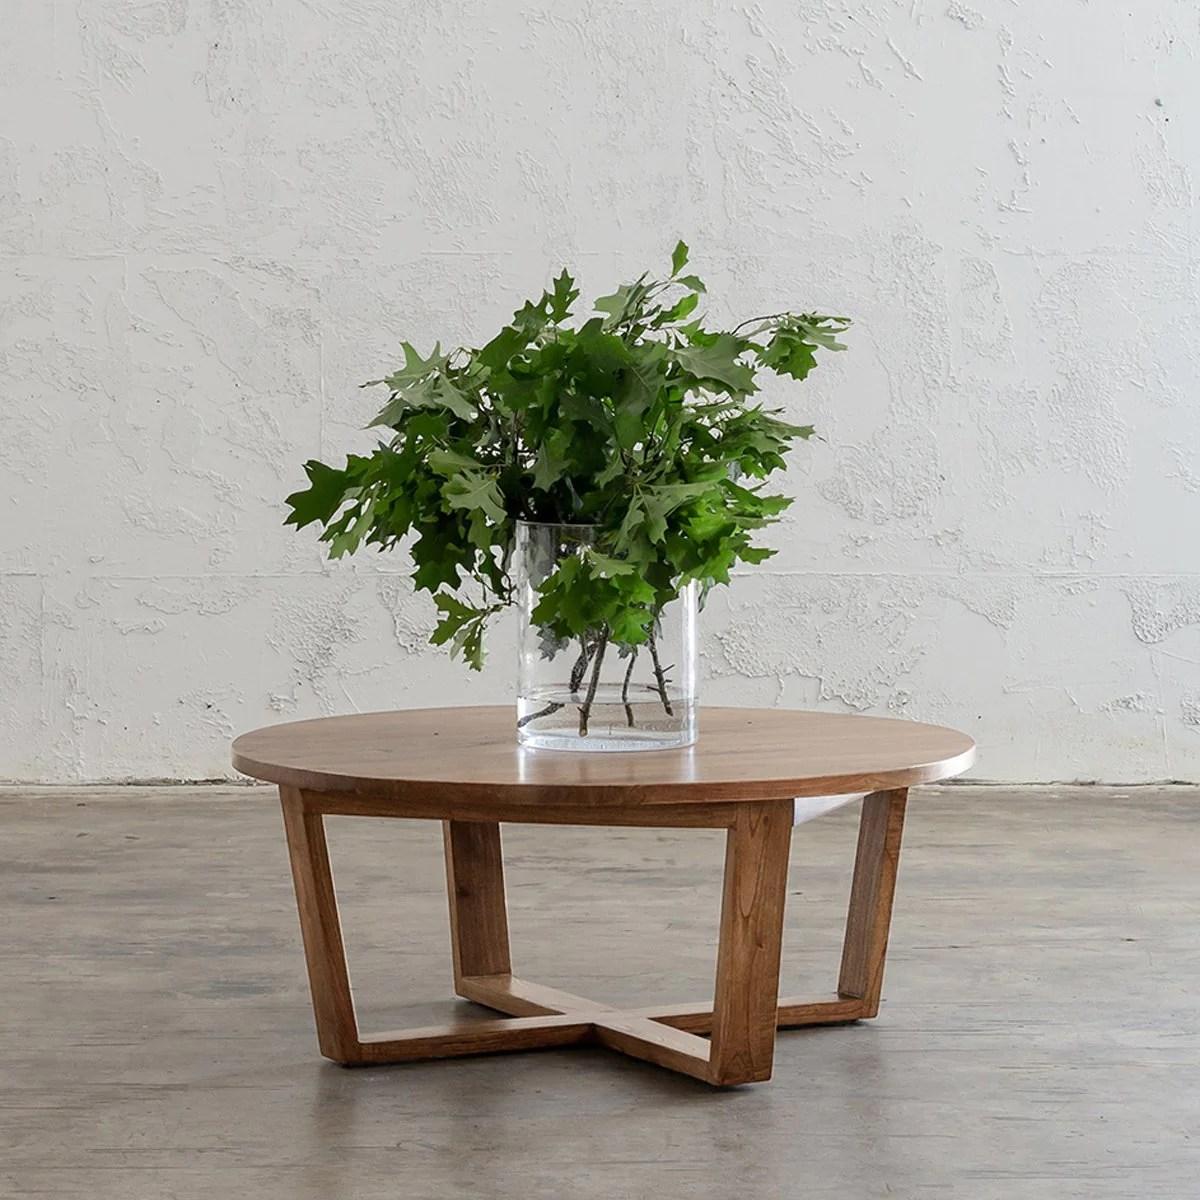 amara mid century timber coffee table plain top round